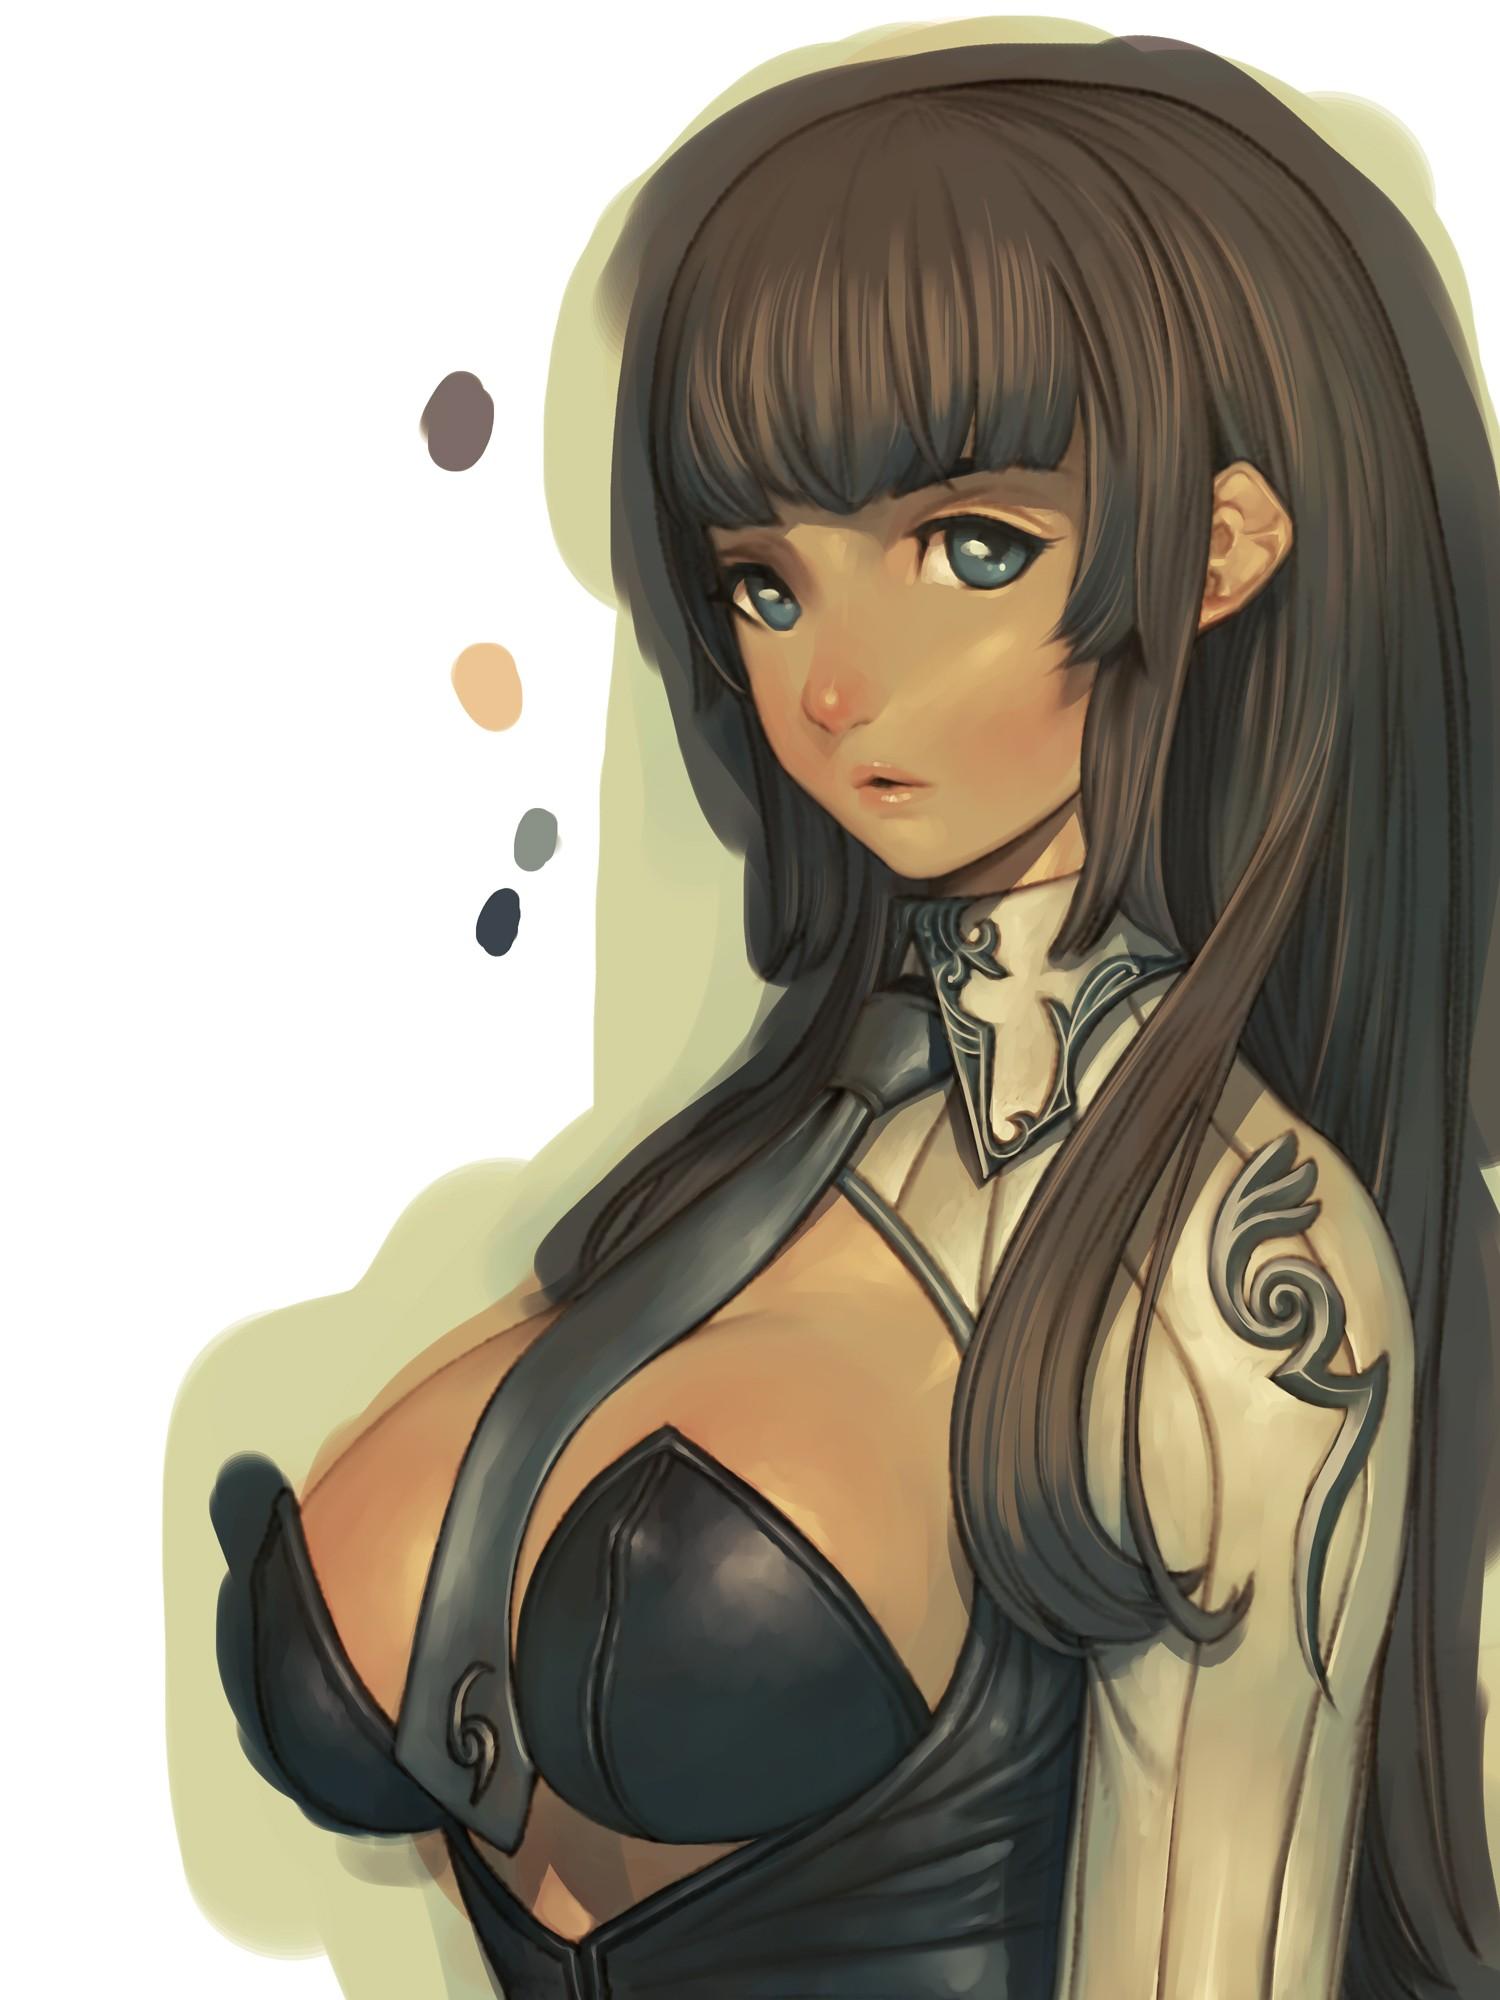 Yokais Tensai Anime_girls_brunette-323142